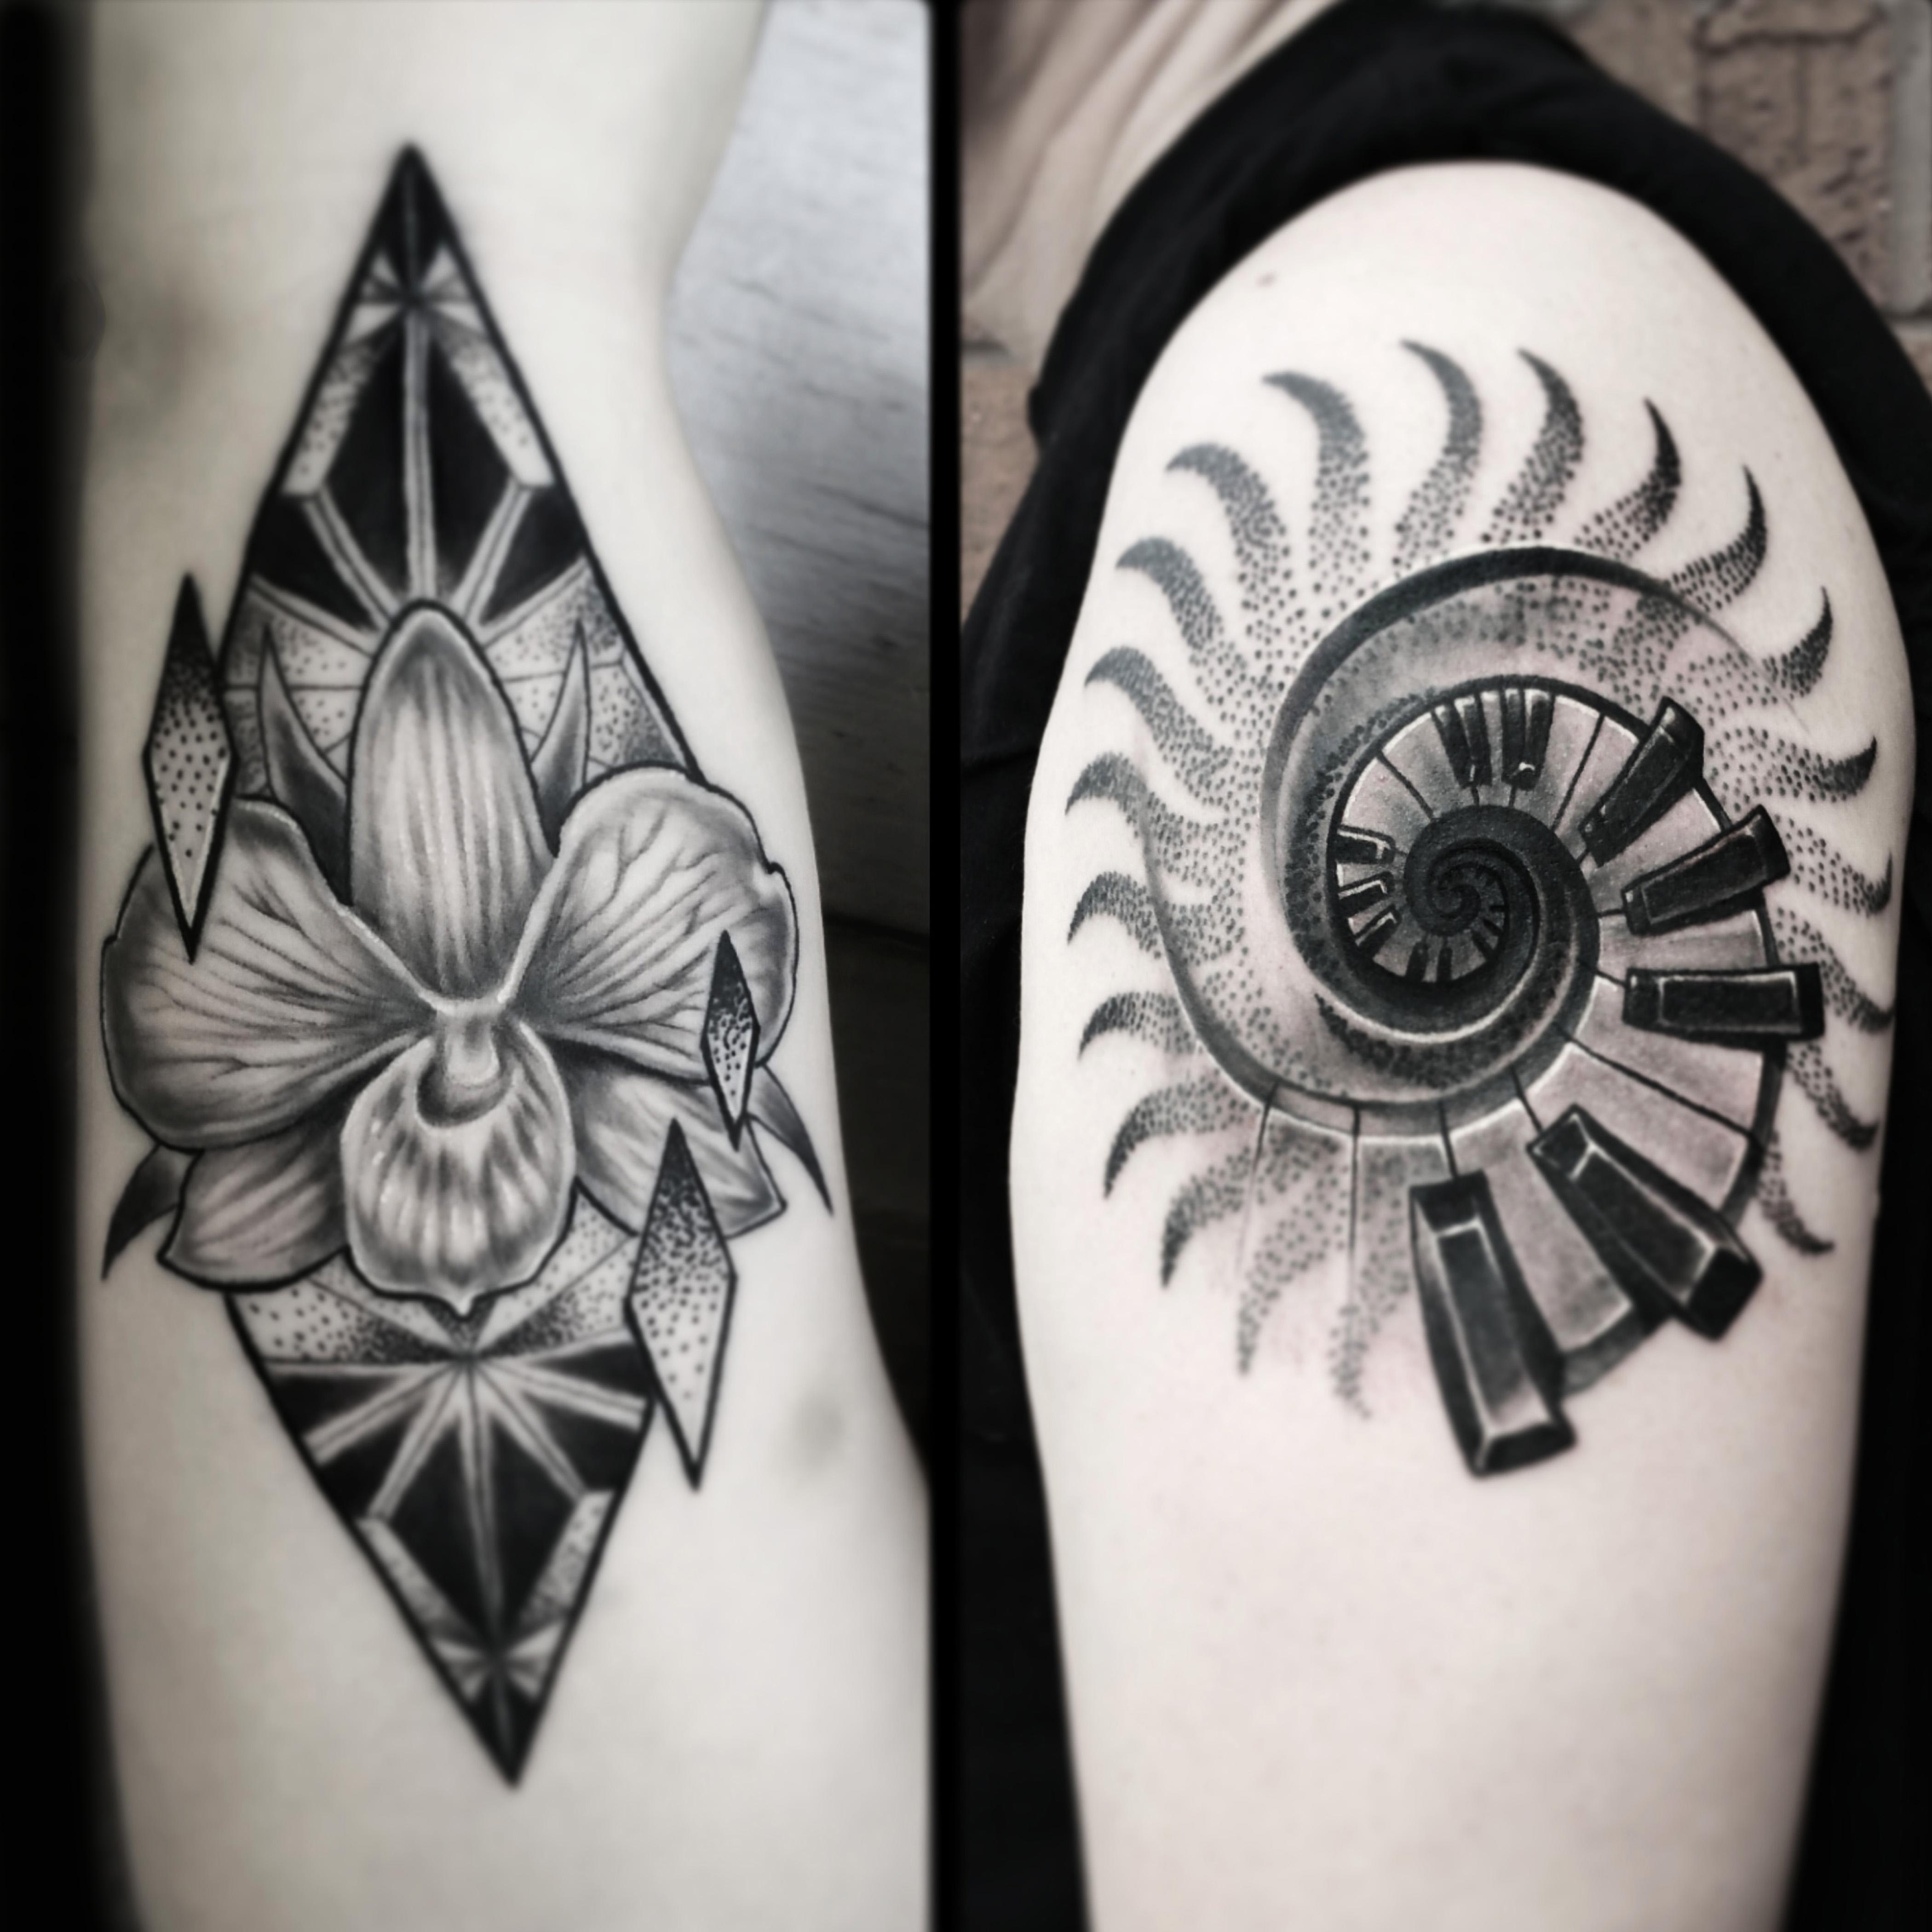 3 small geometric flower and sun tattoo